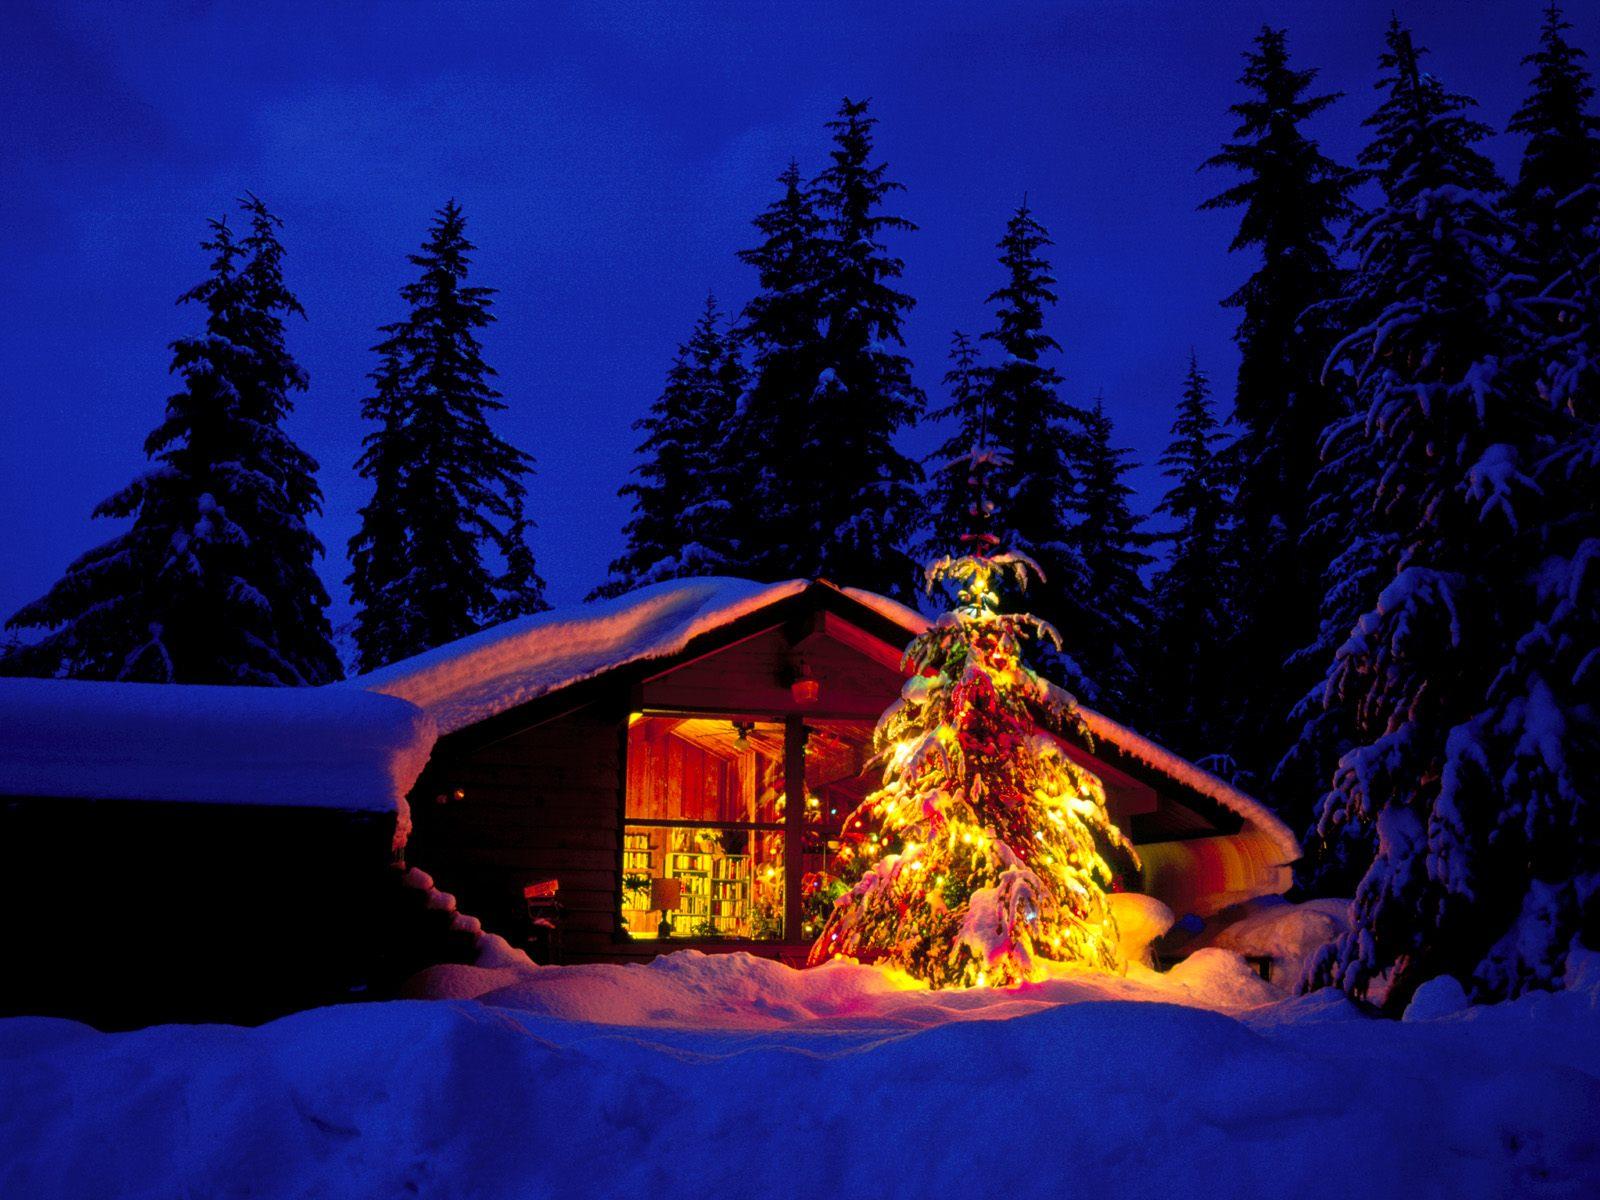 100 Holiday Scenes Wallpaper Hd Wallpapers: Christmas Wallpaper